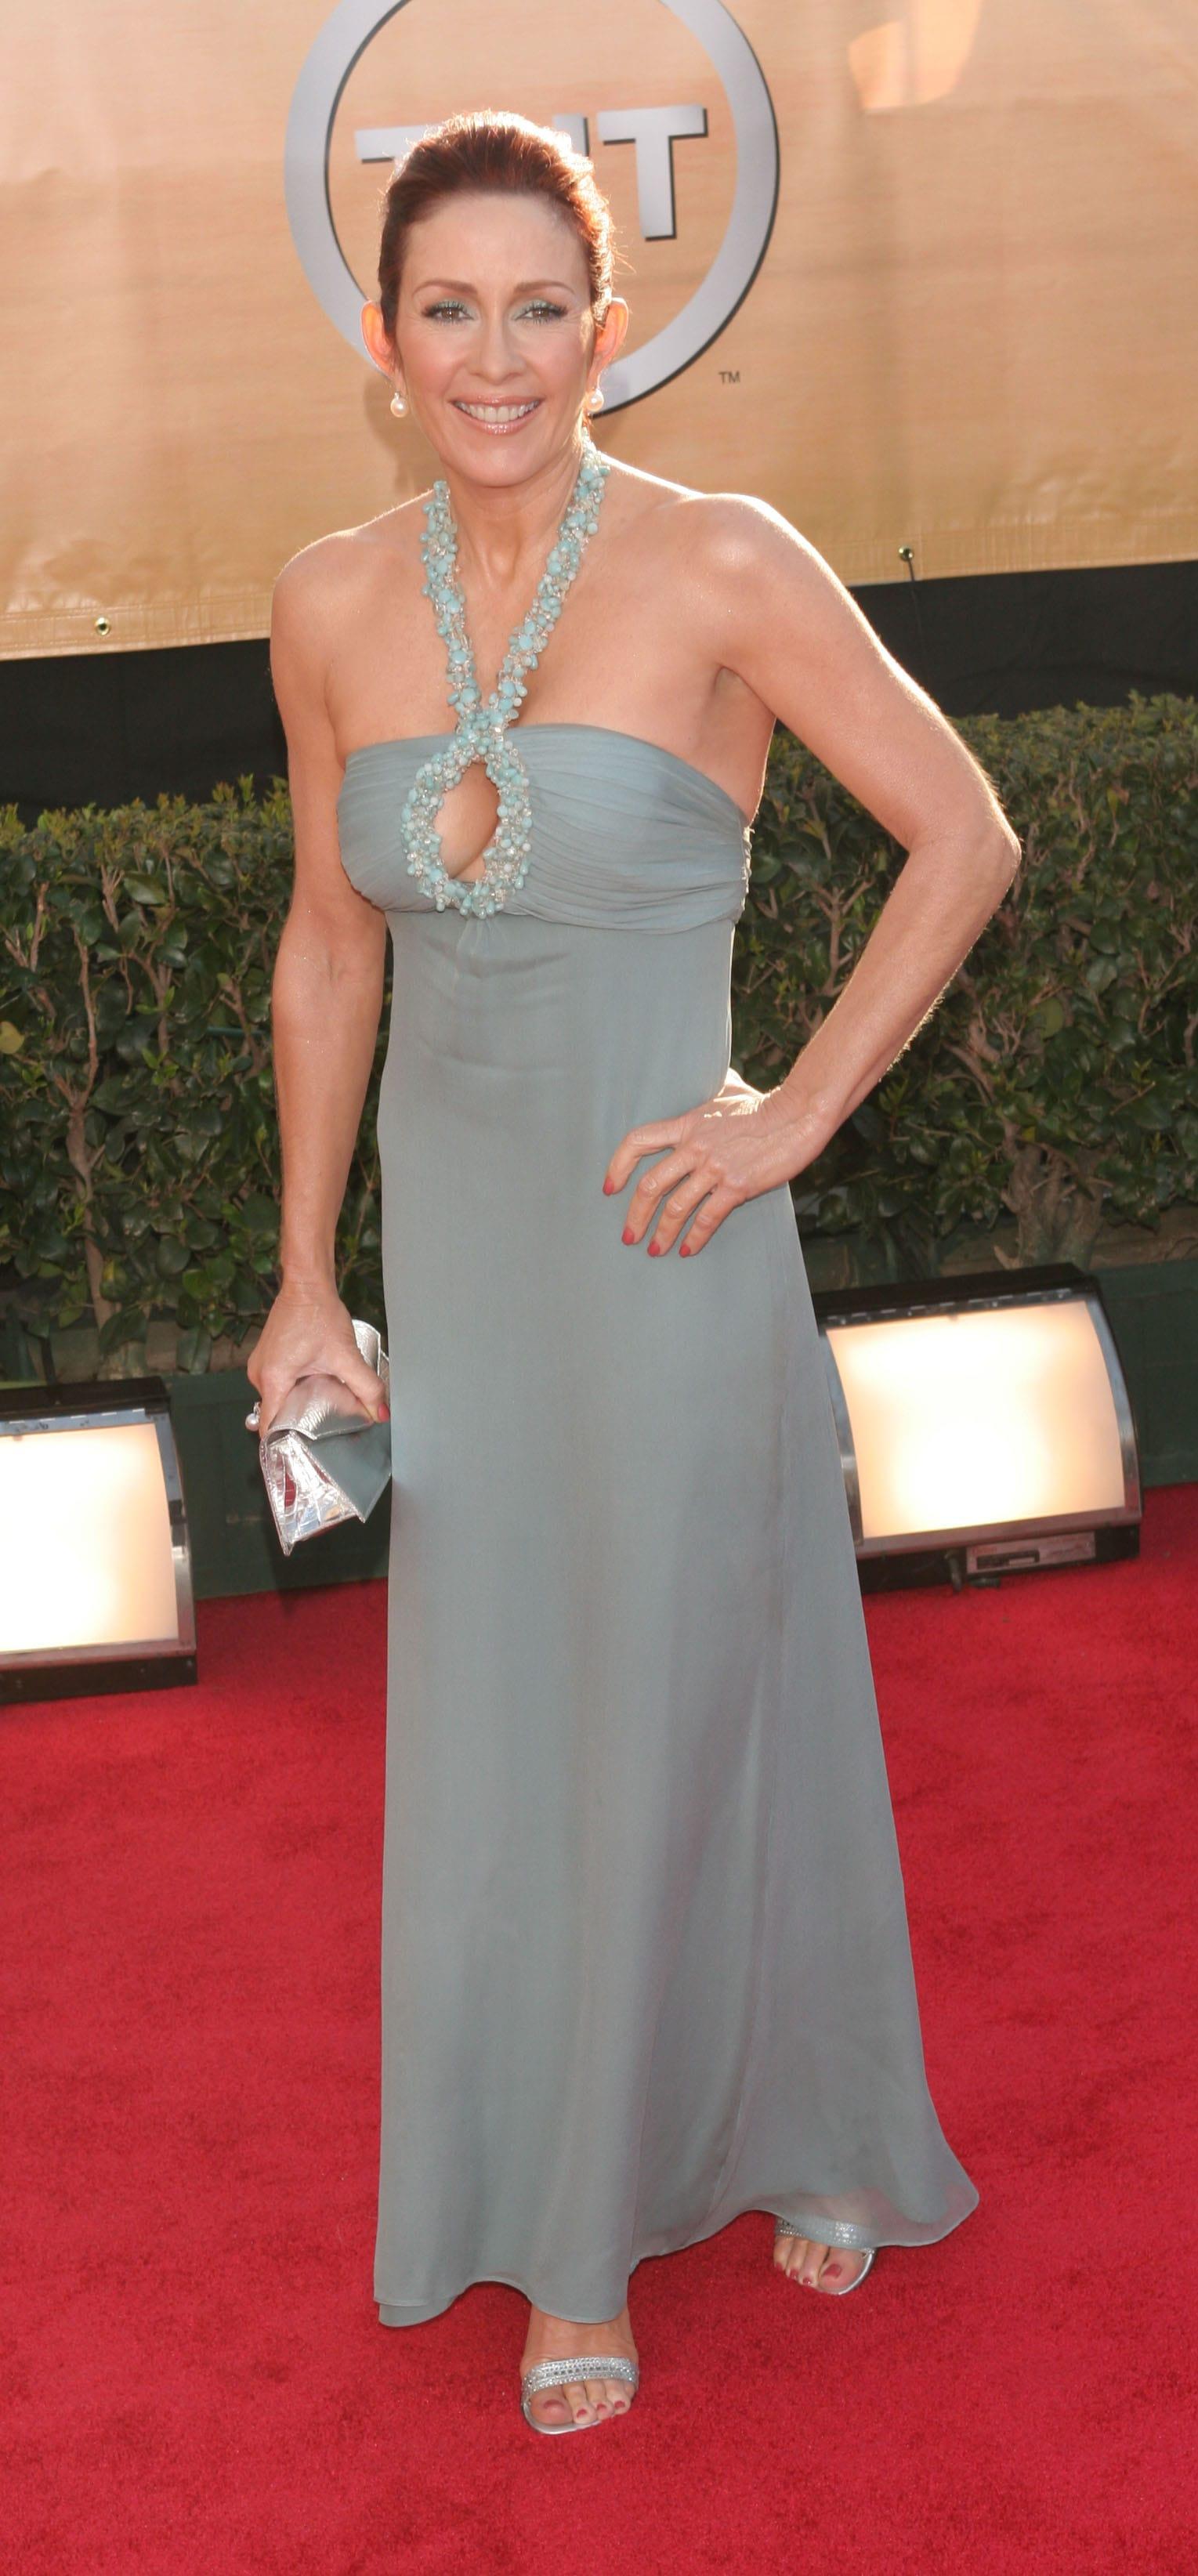 Patricia Heaton cleavage